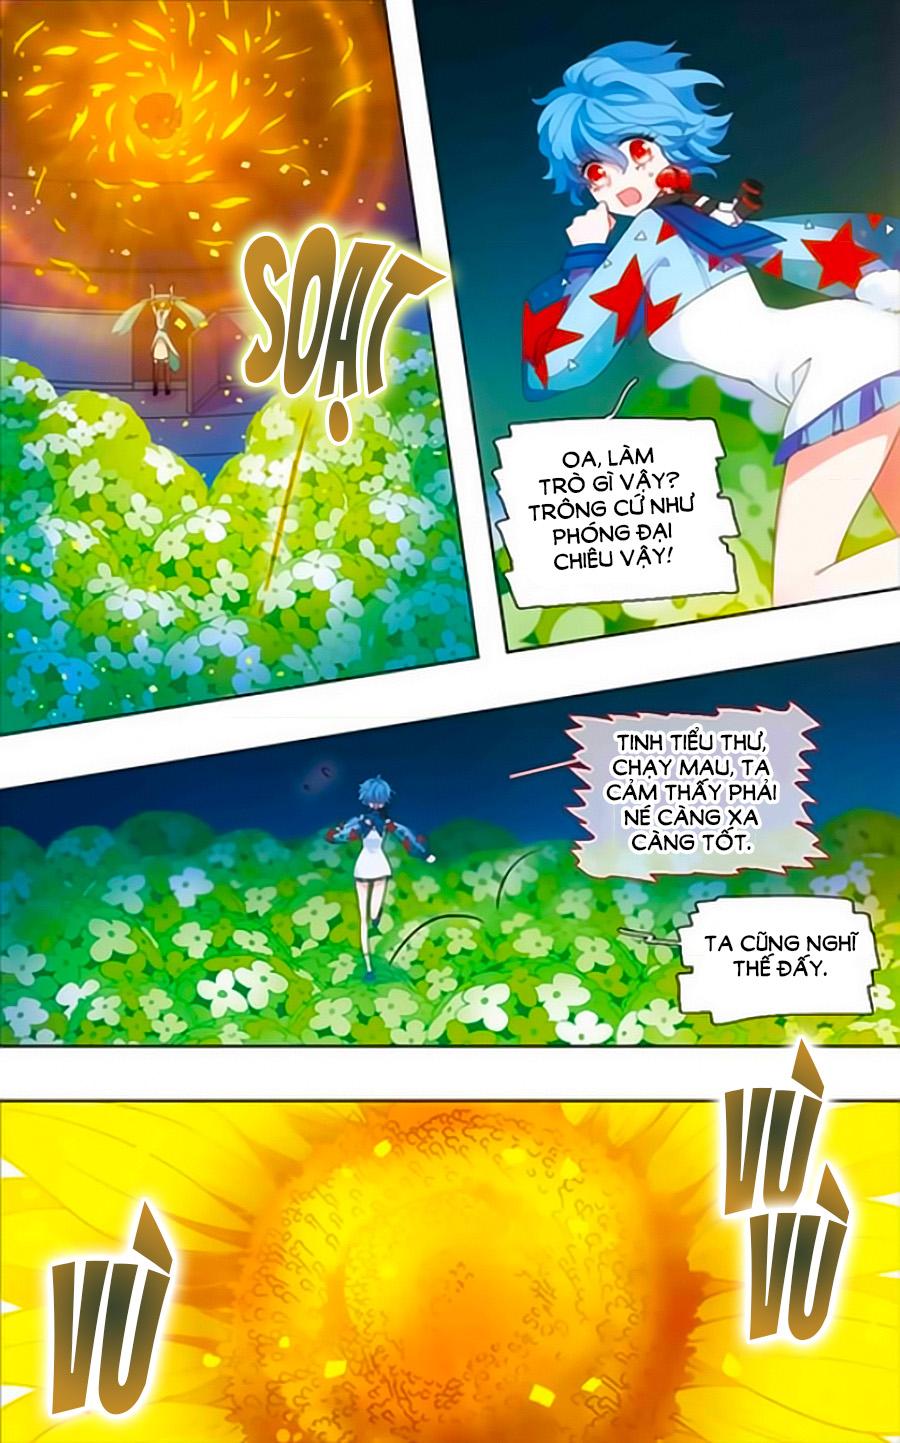 Tinh Linh Tố Chap 12 - Trang 6